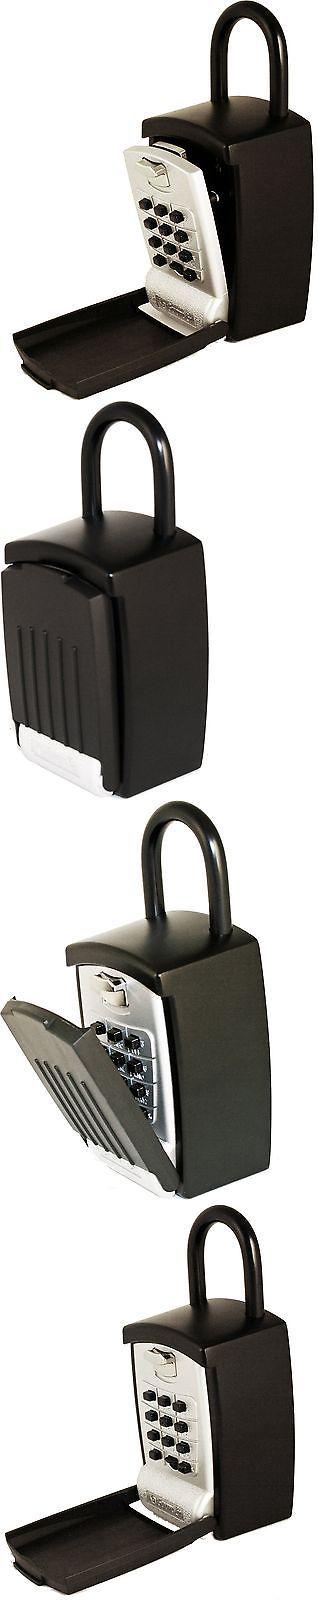 Hide-a-Keys 115945: Keyguard Sl-501 Punch Button Large Capacity Key Storage Shackle Lock Box -> BUY IT NOW ONLY: $40.89 on eBay!